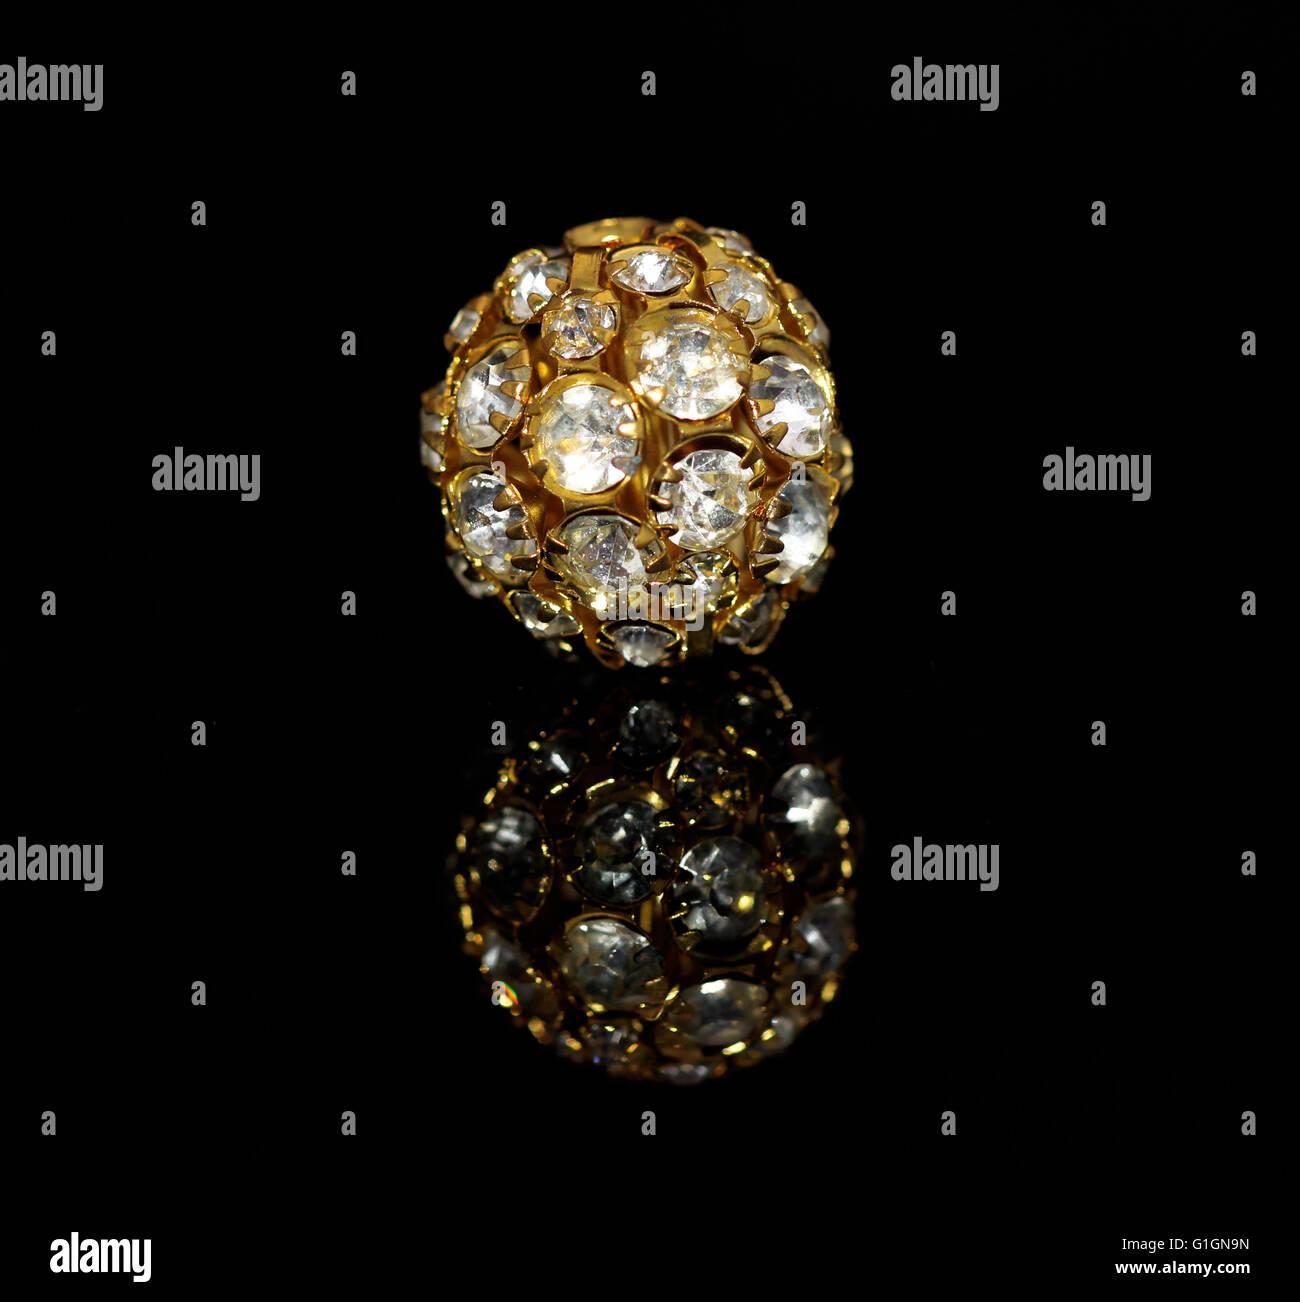 The golden jewel - Stock Image